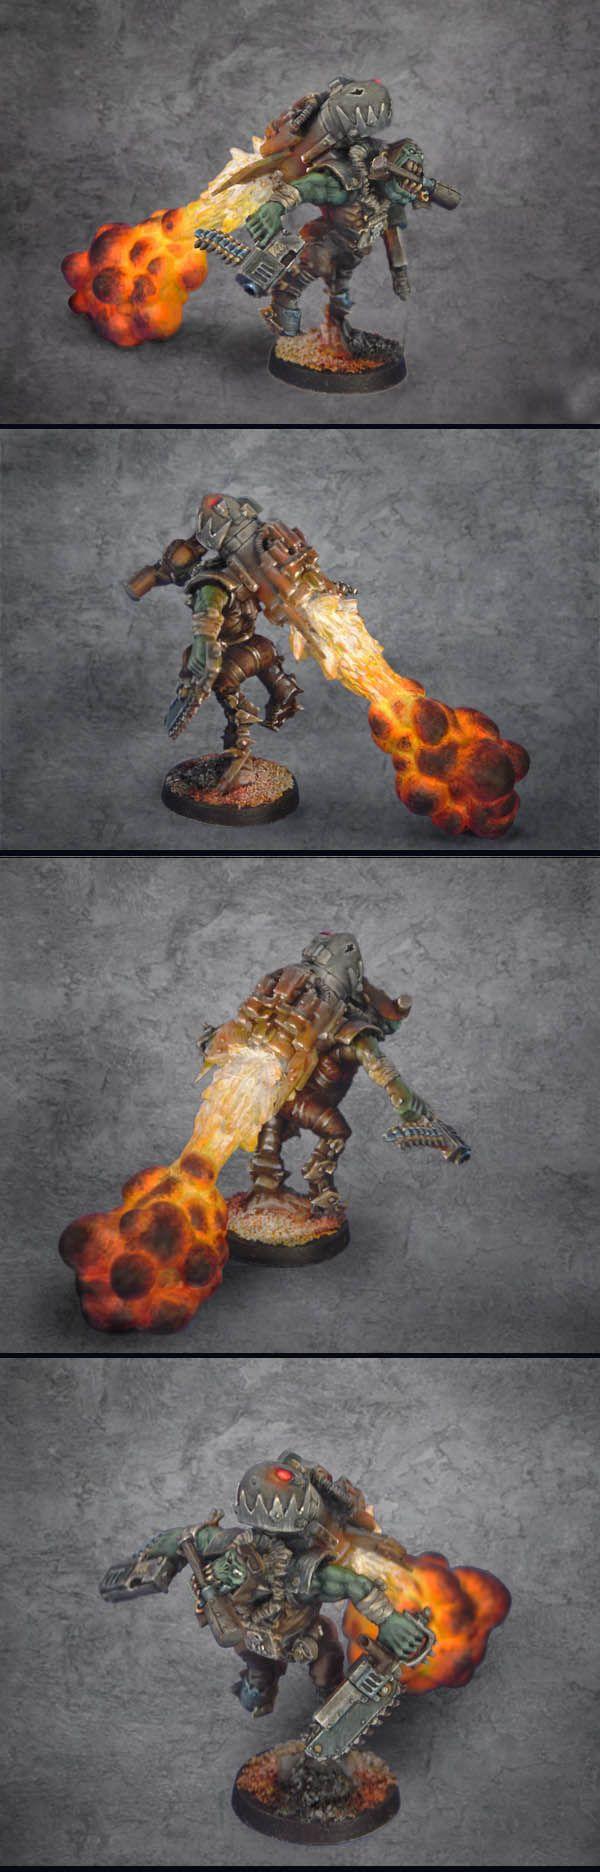 Ork Stormboy conversion, exhaust plume, Warhammer 40k.